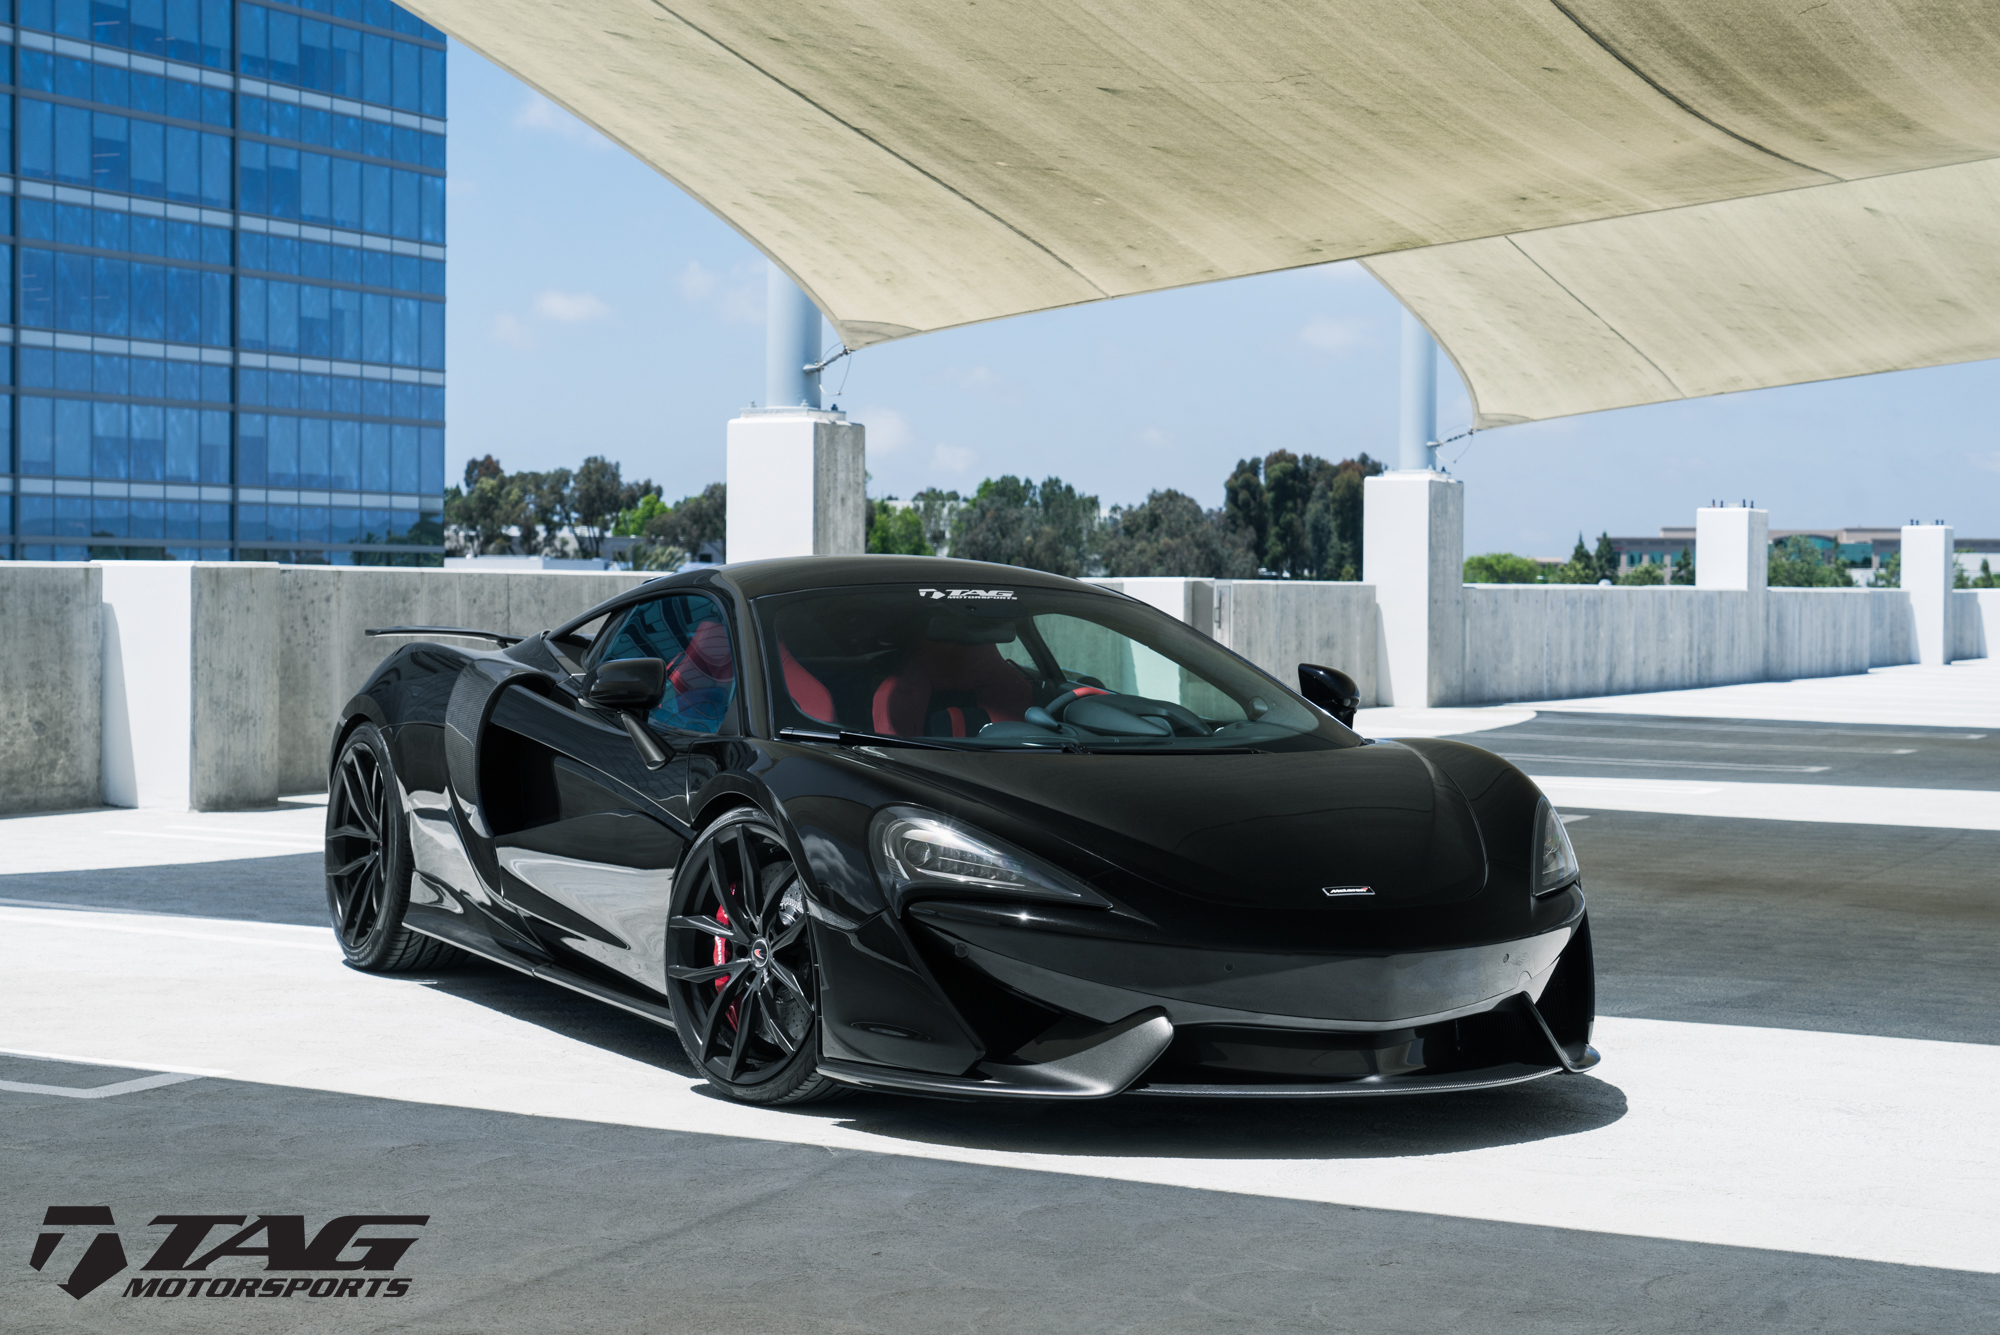 Novitec McLaren 570S - FULL Build by TAG Motorsports